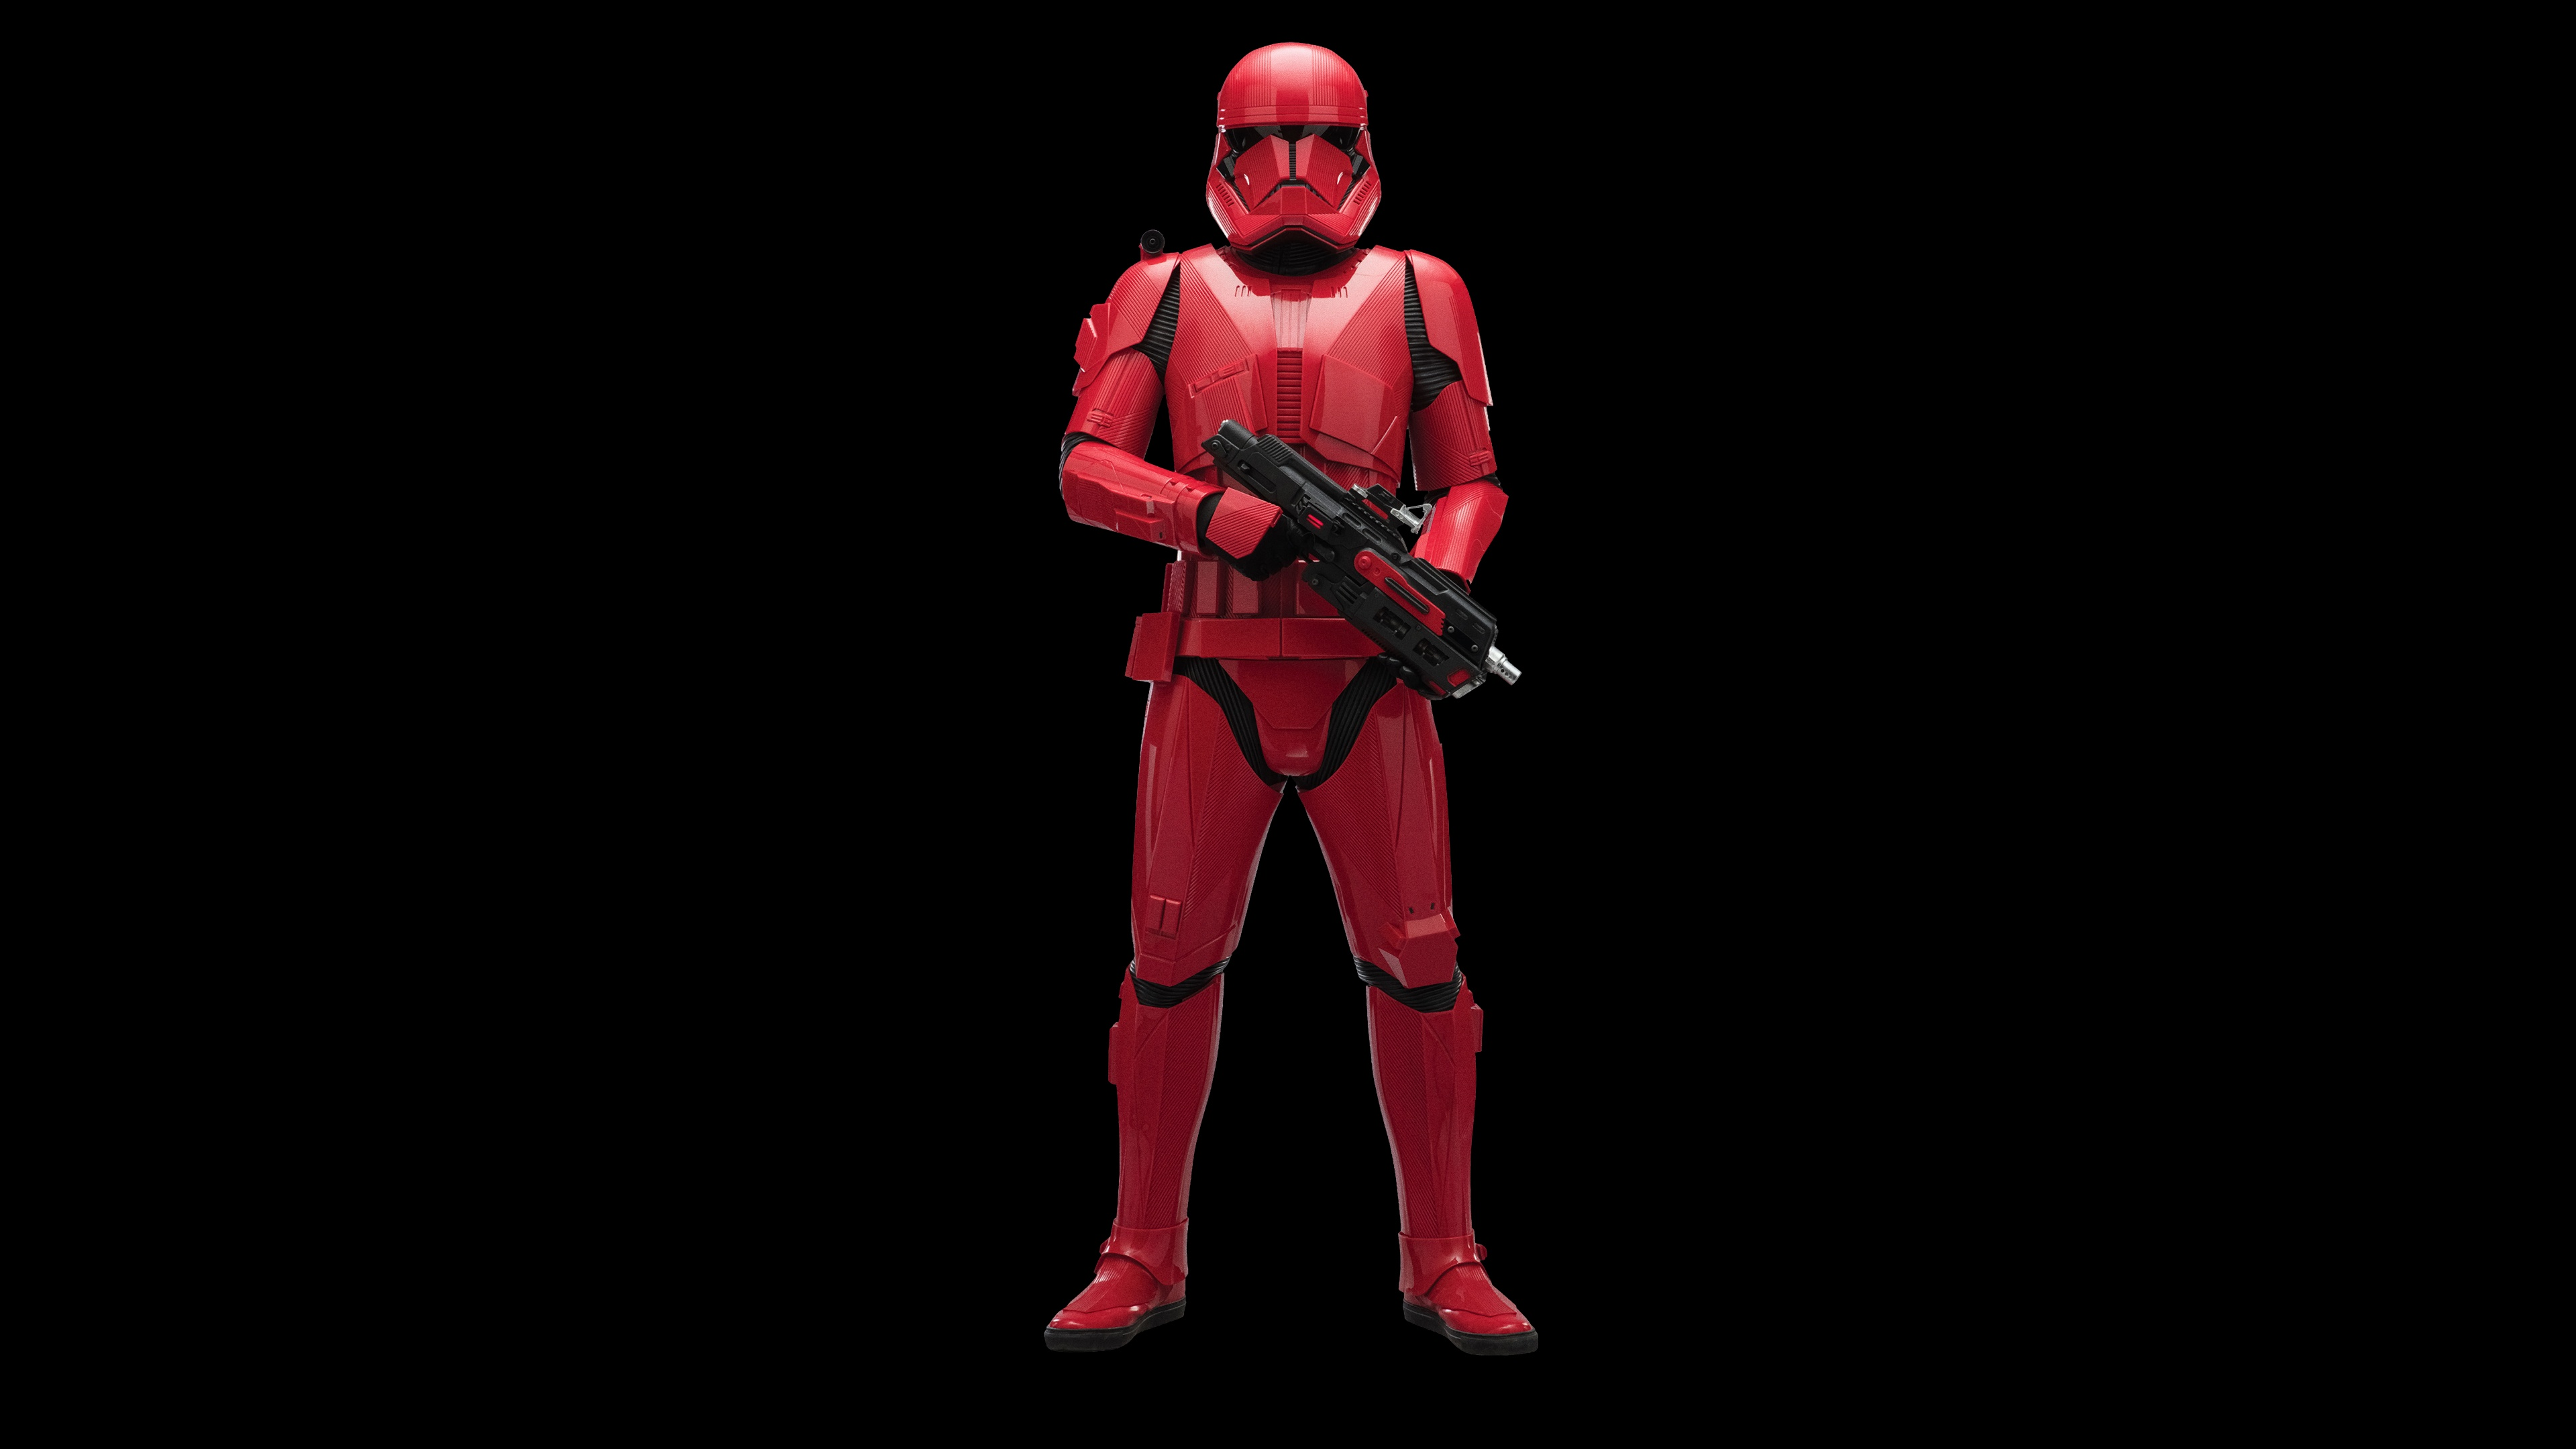 Sith Trooper 4k Wallpaper Star Wars The Rise Of Skywalker Black Background 5k 8k Movies 876